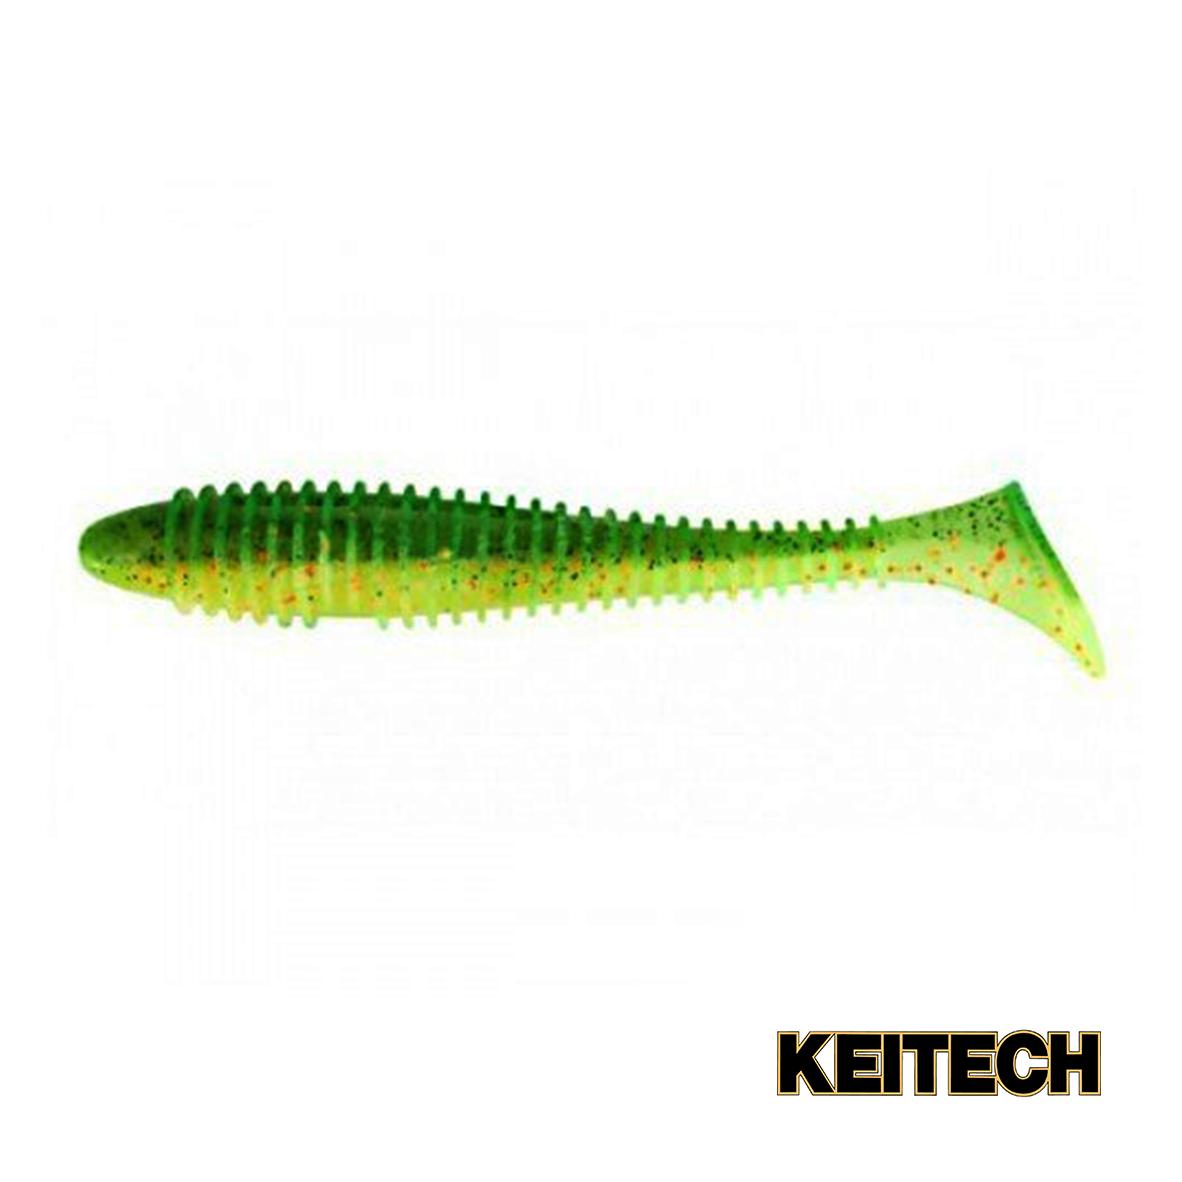 "Силикон Keitech Swing Impact FAT 3.8"" (6 шт/упак) ц:ea#05 hot fir"